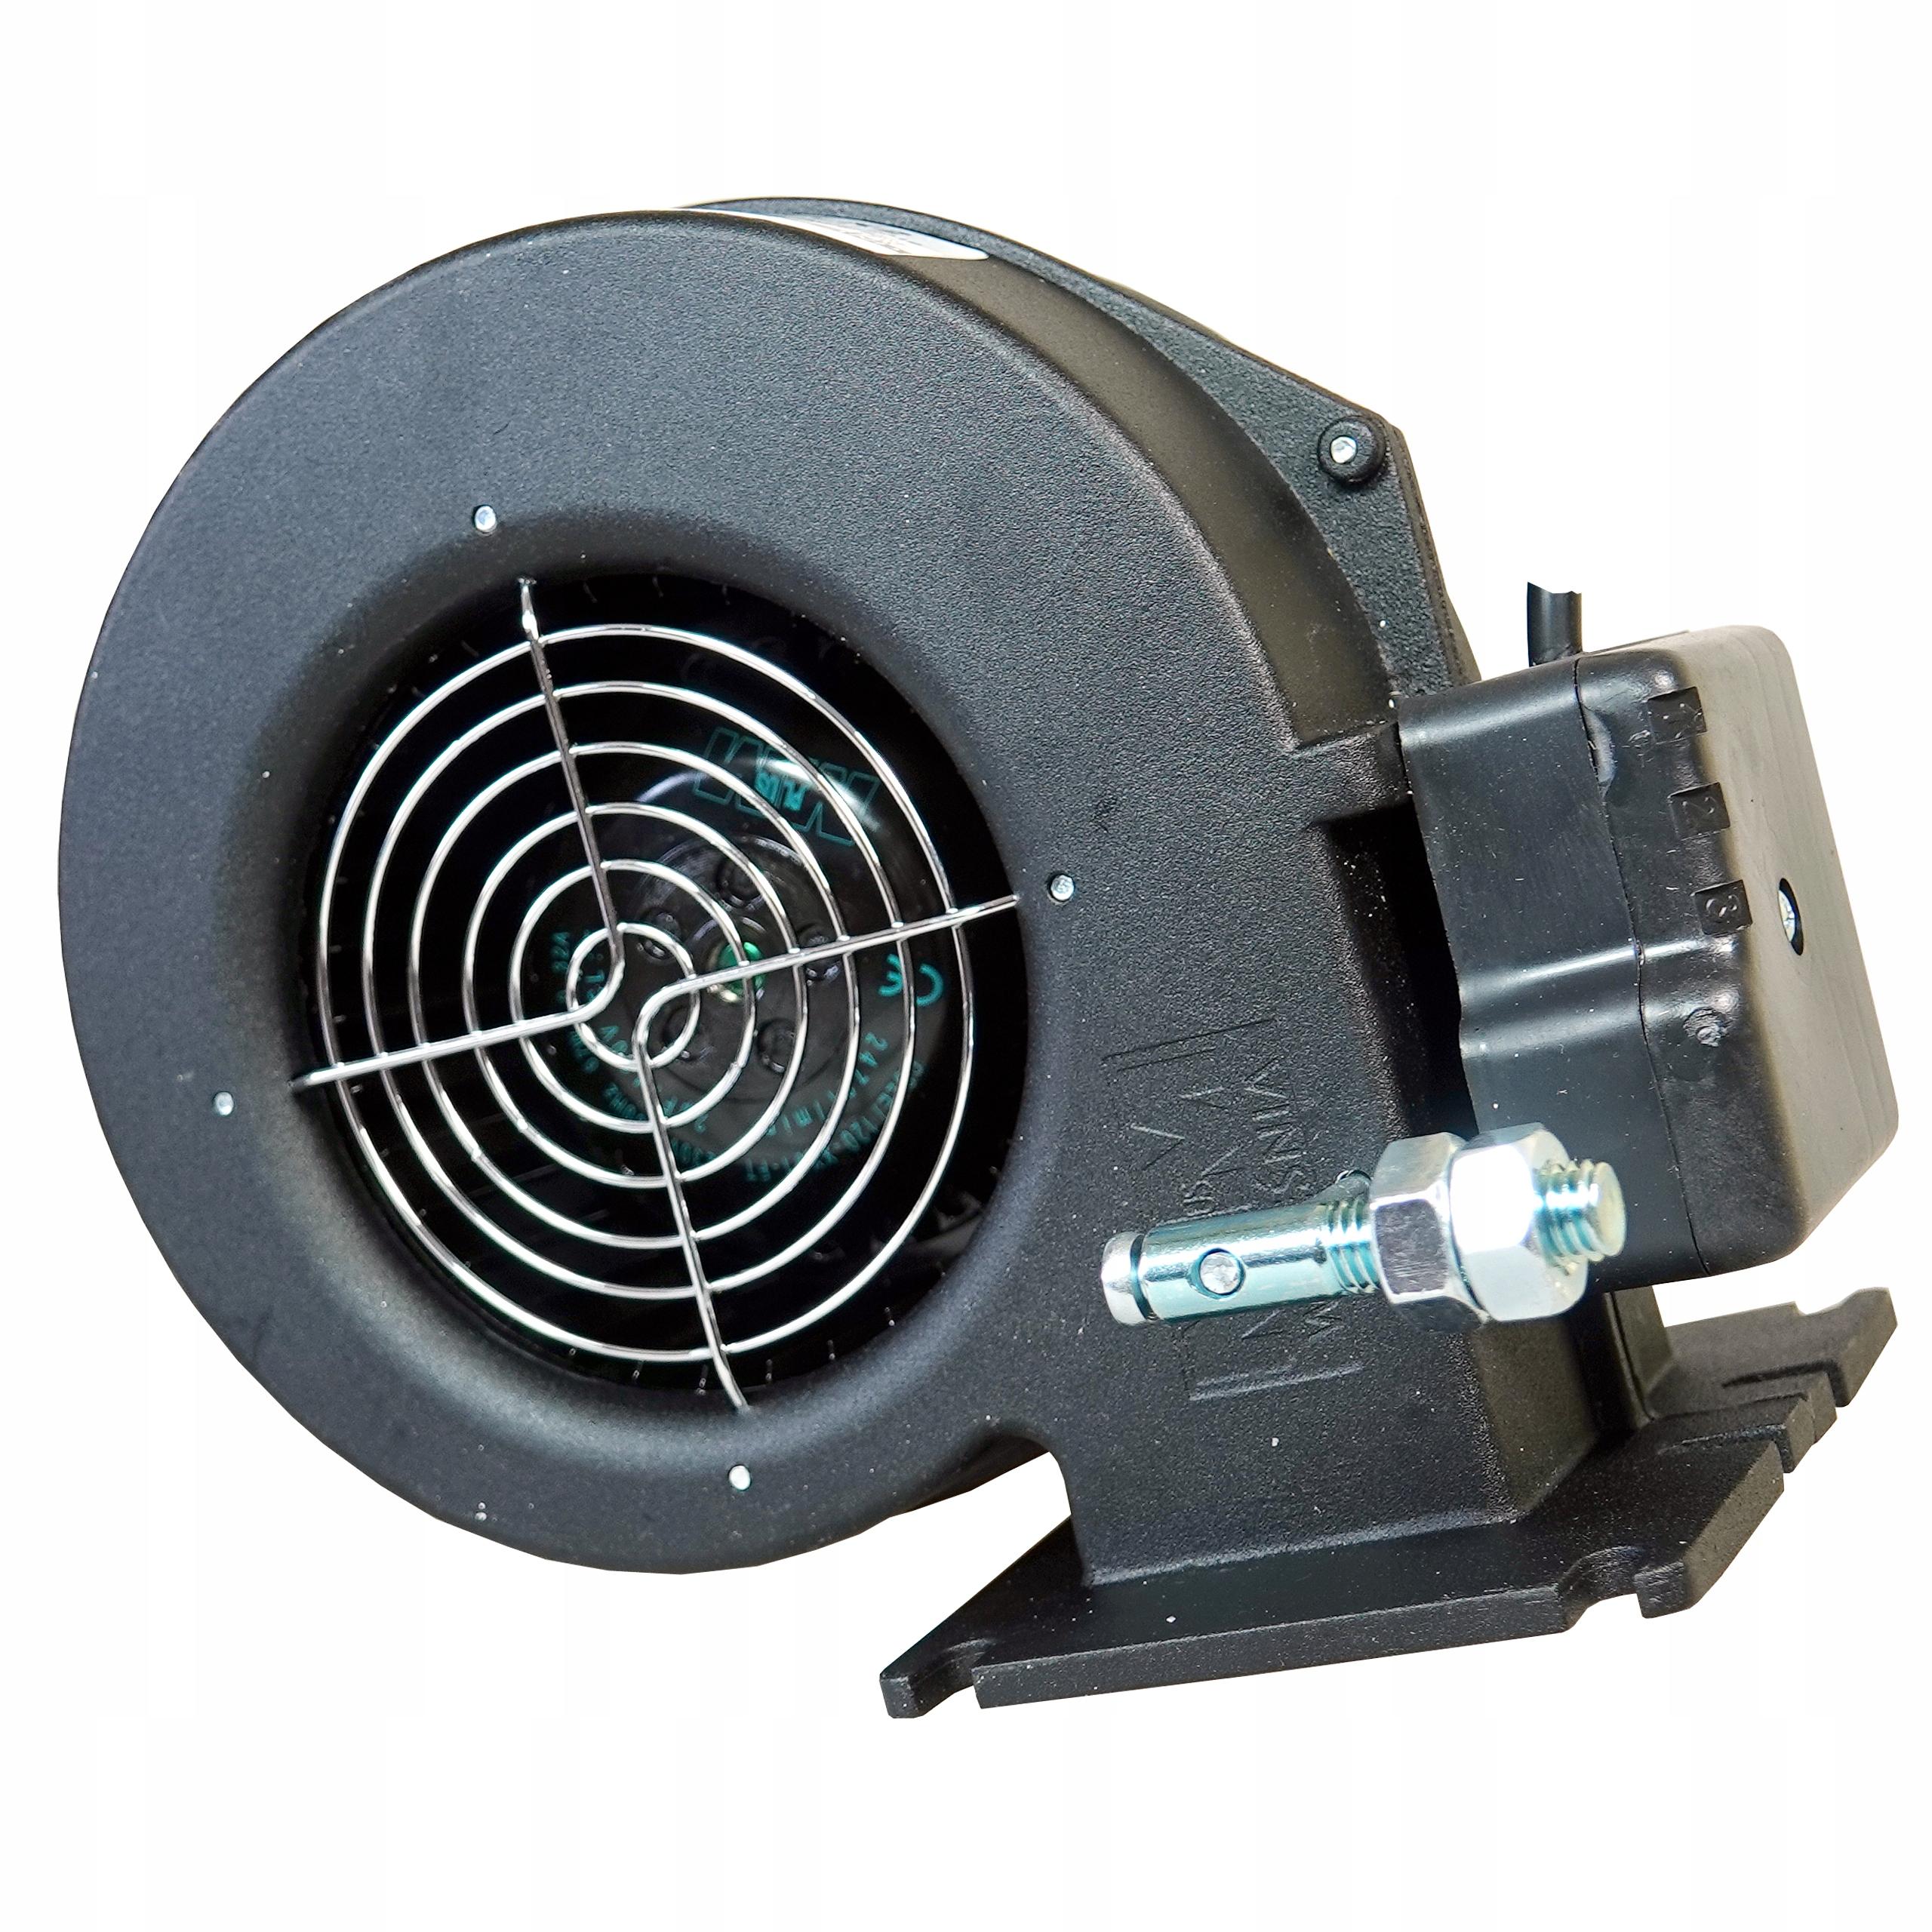 Dúchadlo WPA x2 WPA 120 67W ventilátor kotlovej pece